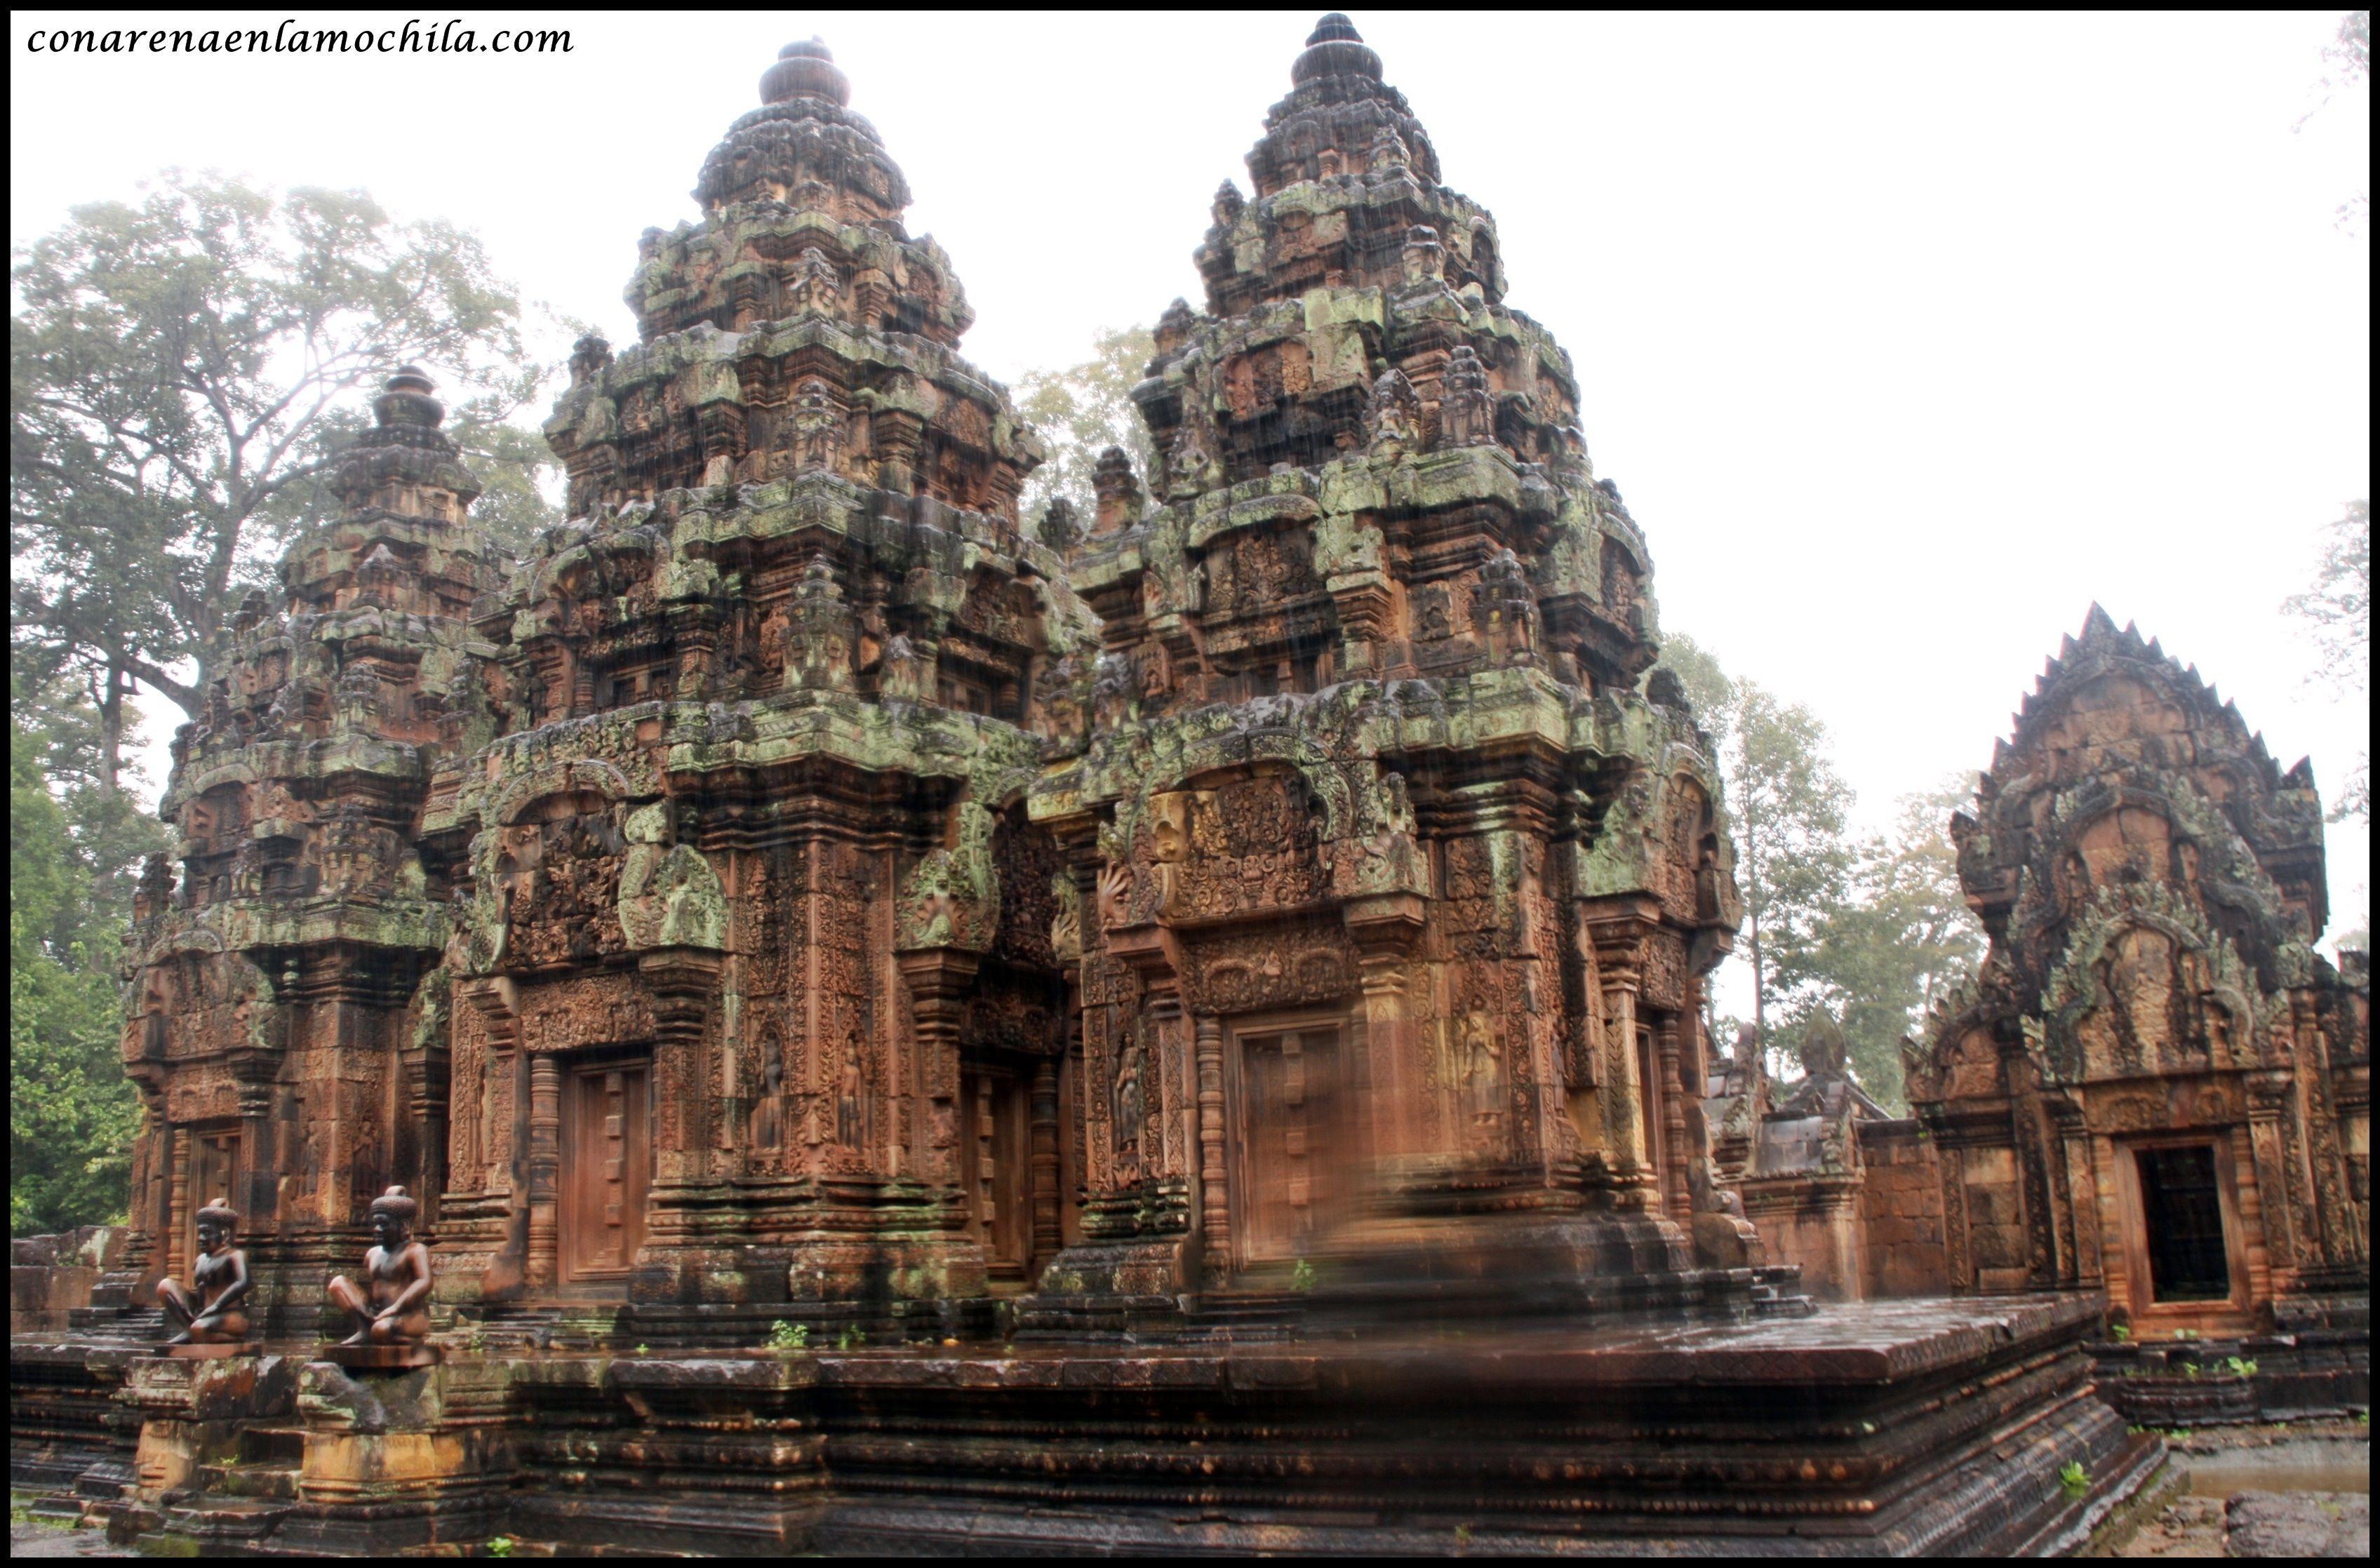 Banteay Srei Angkor Siem Reap Camboya